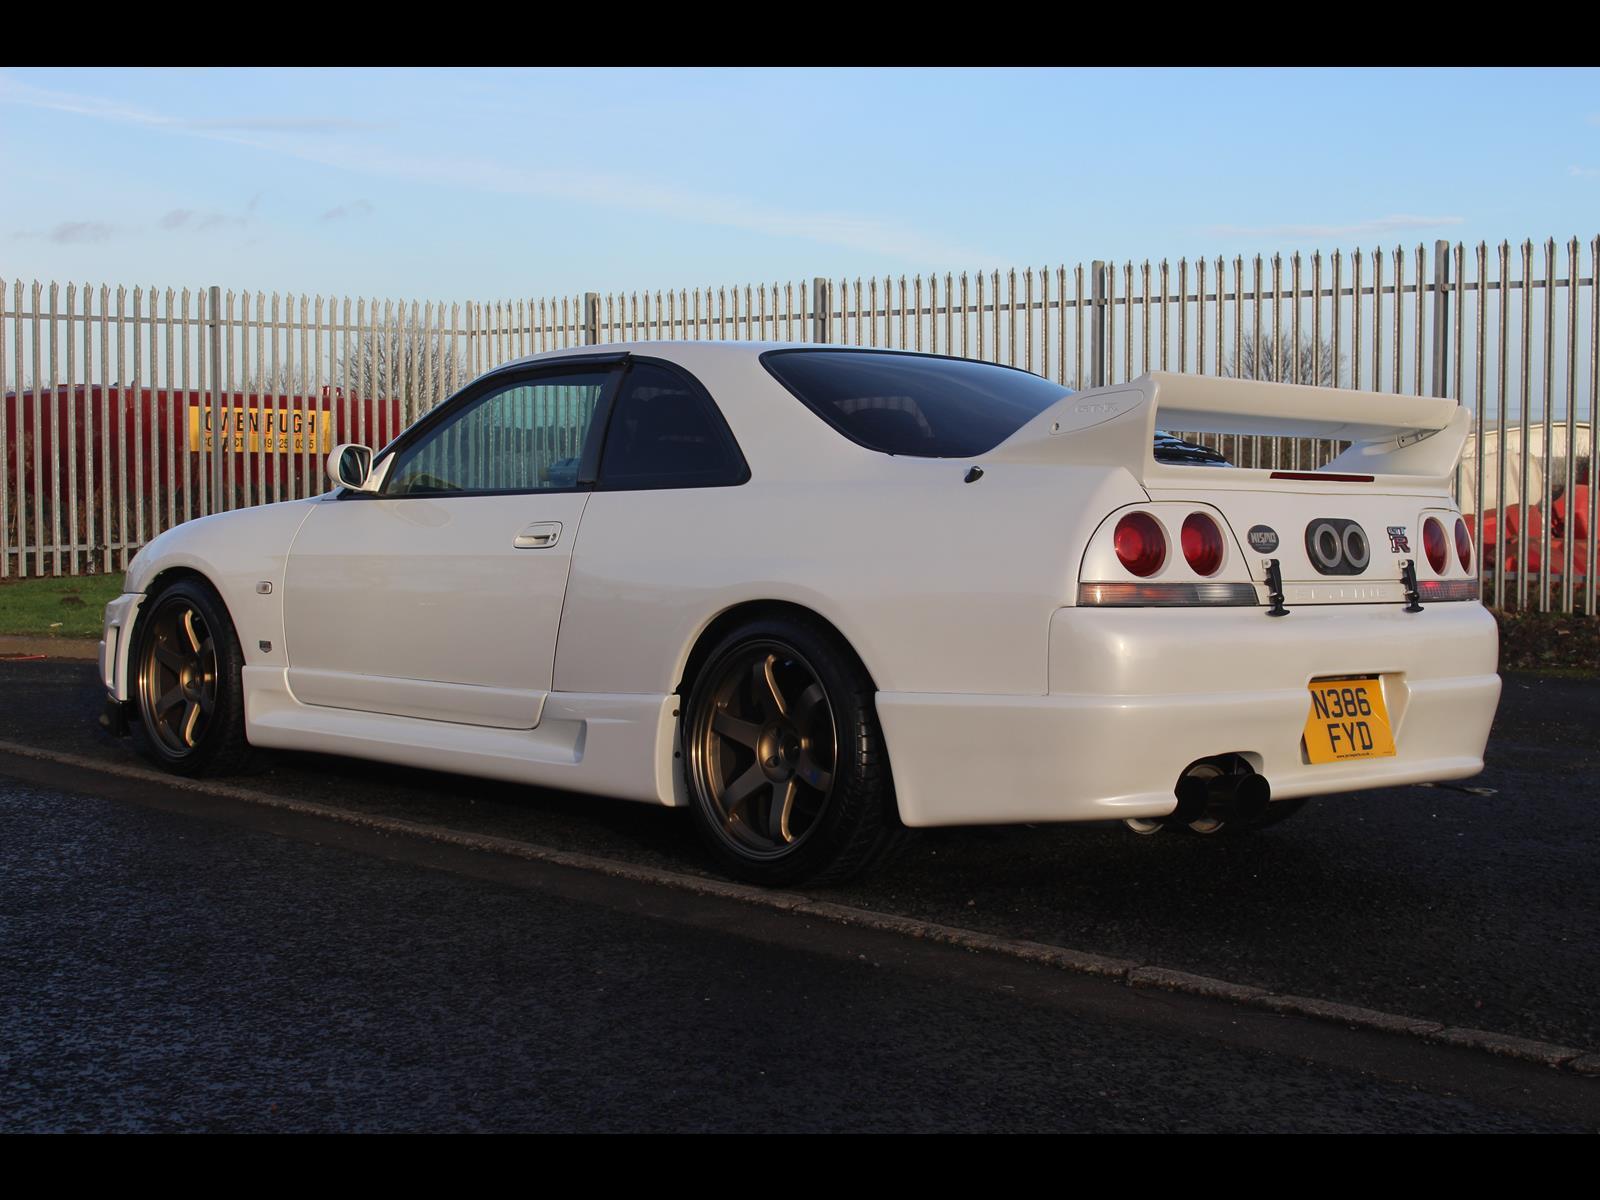 Nissan Skyline Gtr For Sale >> 1995 Nissan Skyline R33 GTR 5 Speed Manual Nismo 400R Kit - JM-Imports